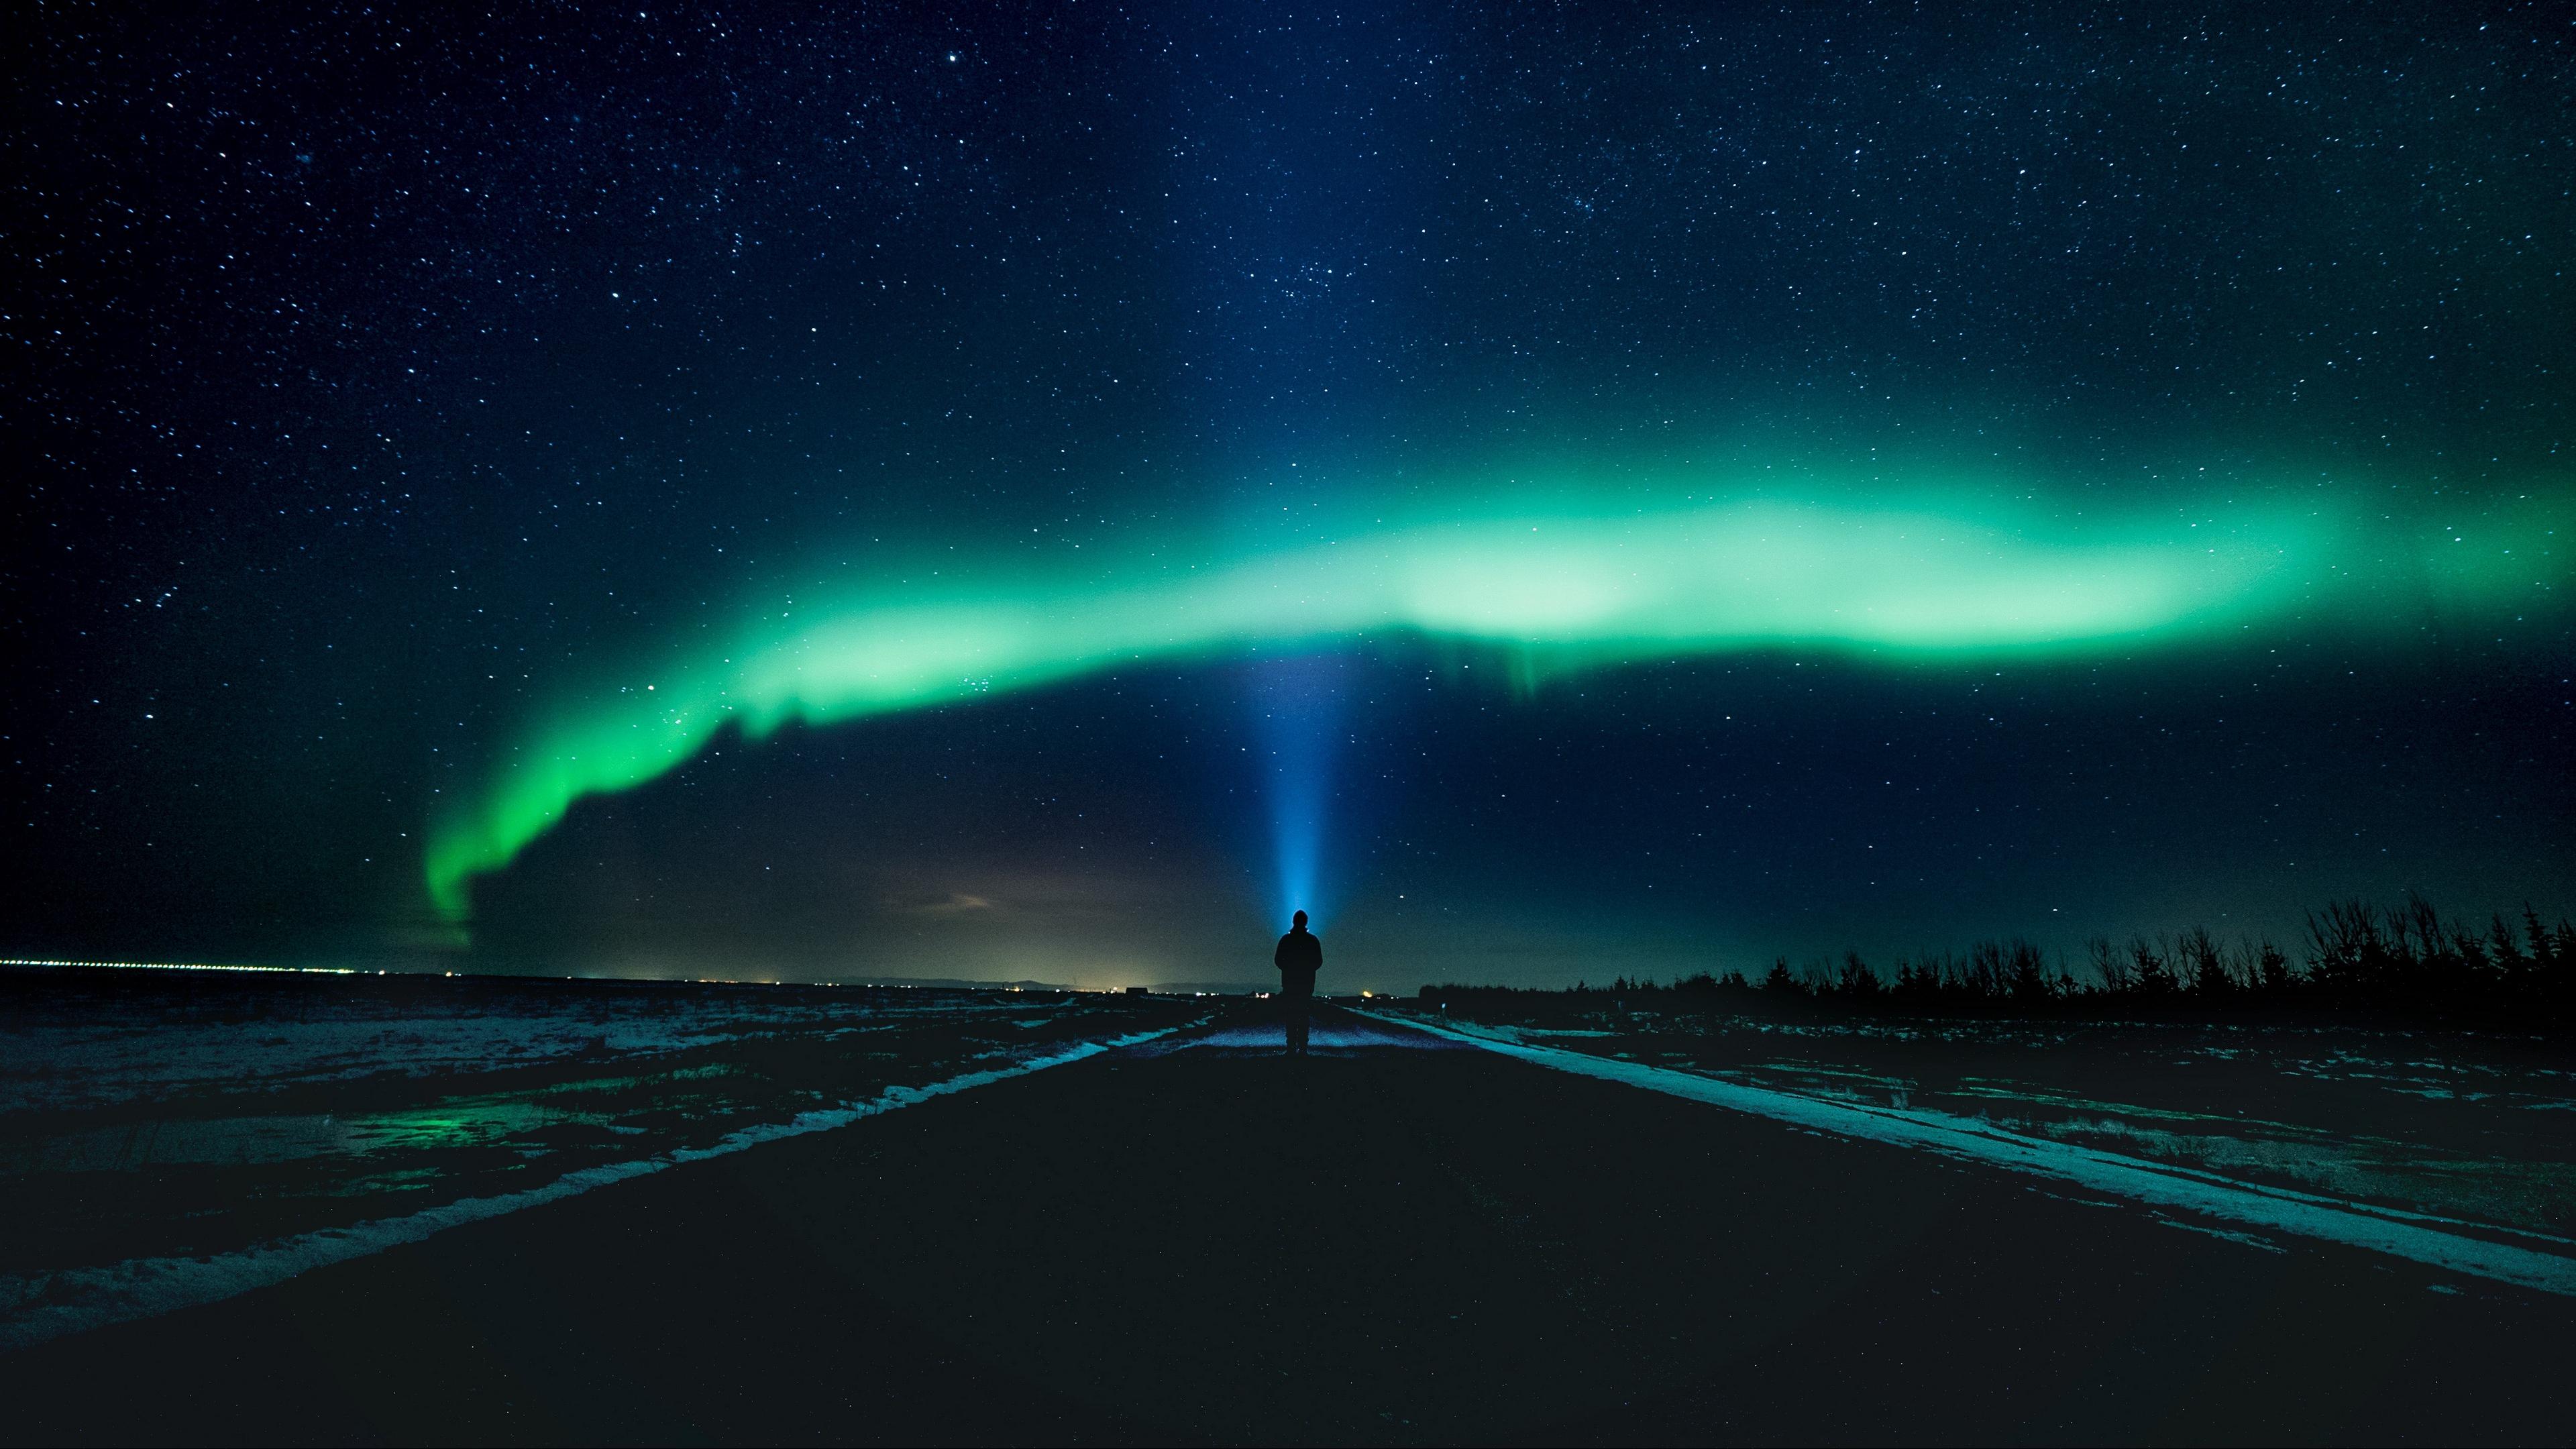 silhouette starry sky shining night 4k 1536016612 - silhouette, starry sky, shining, night 4k - starry sky, Silhouette, Shining